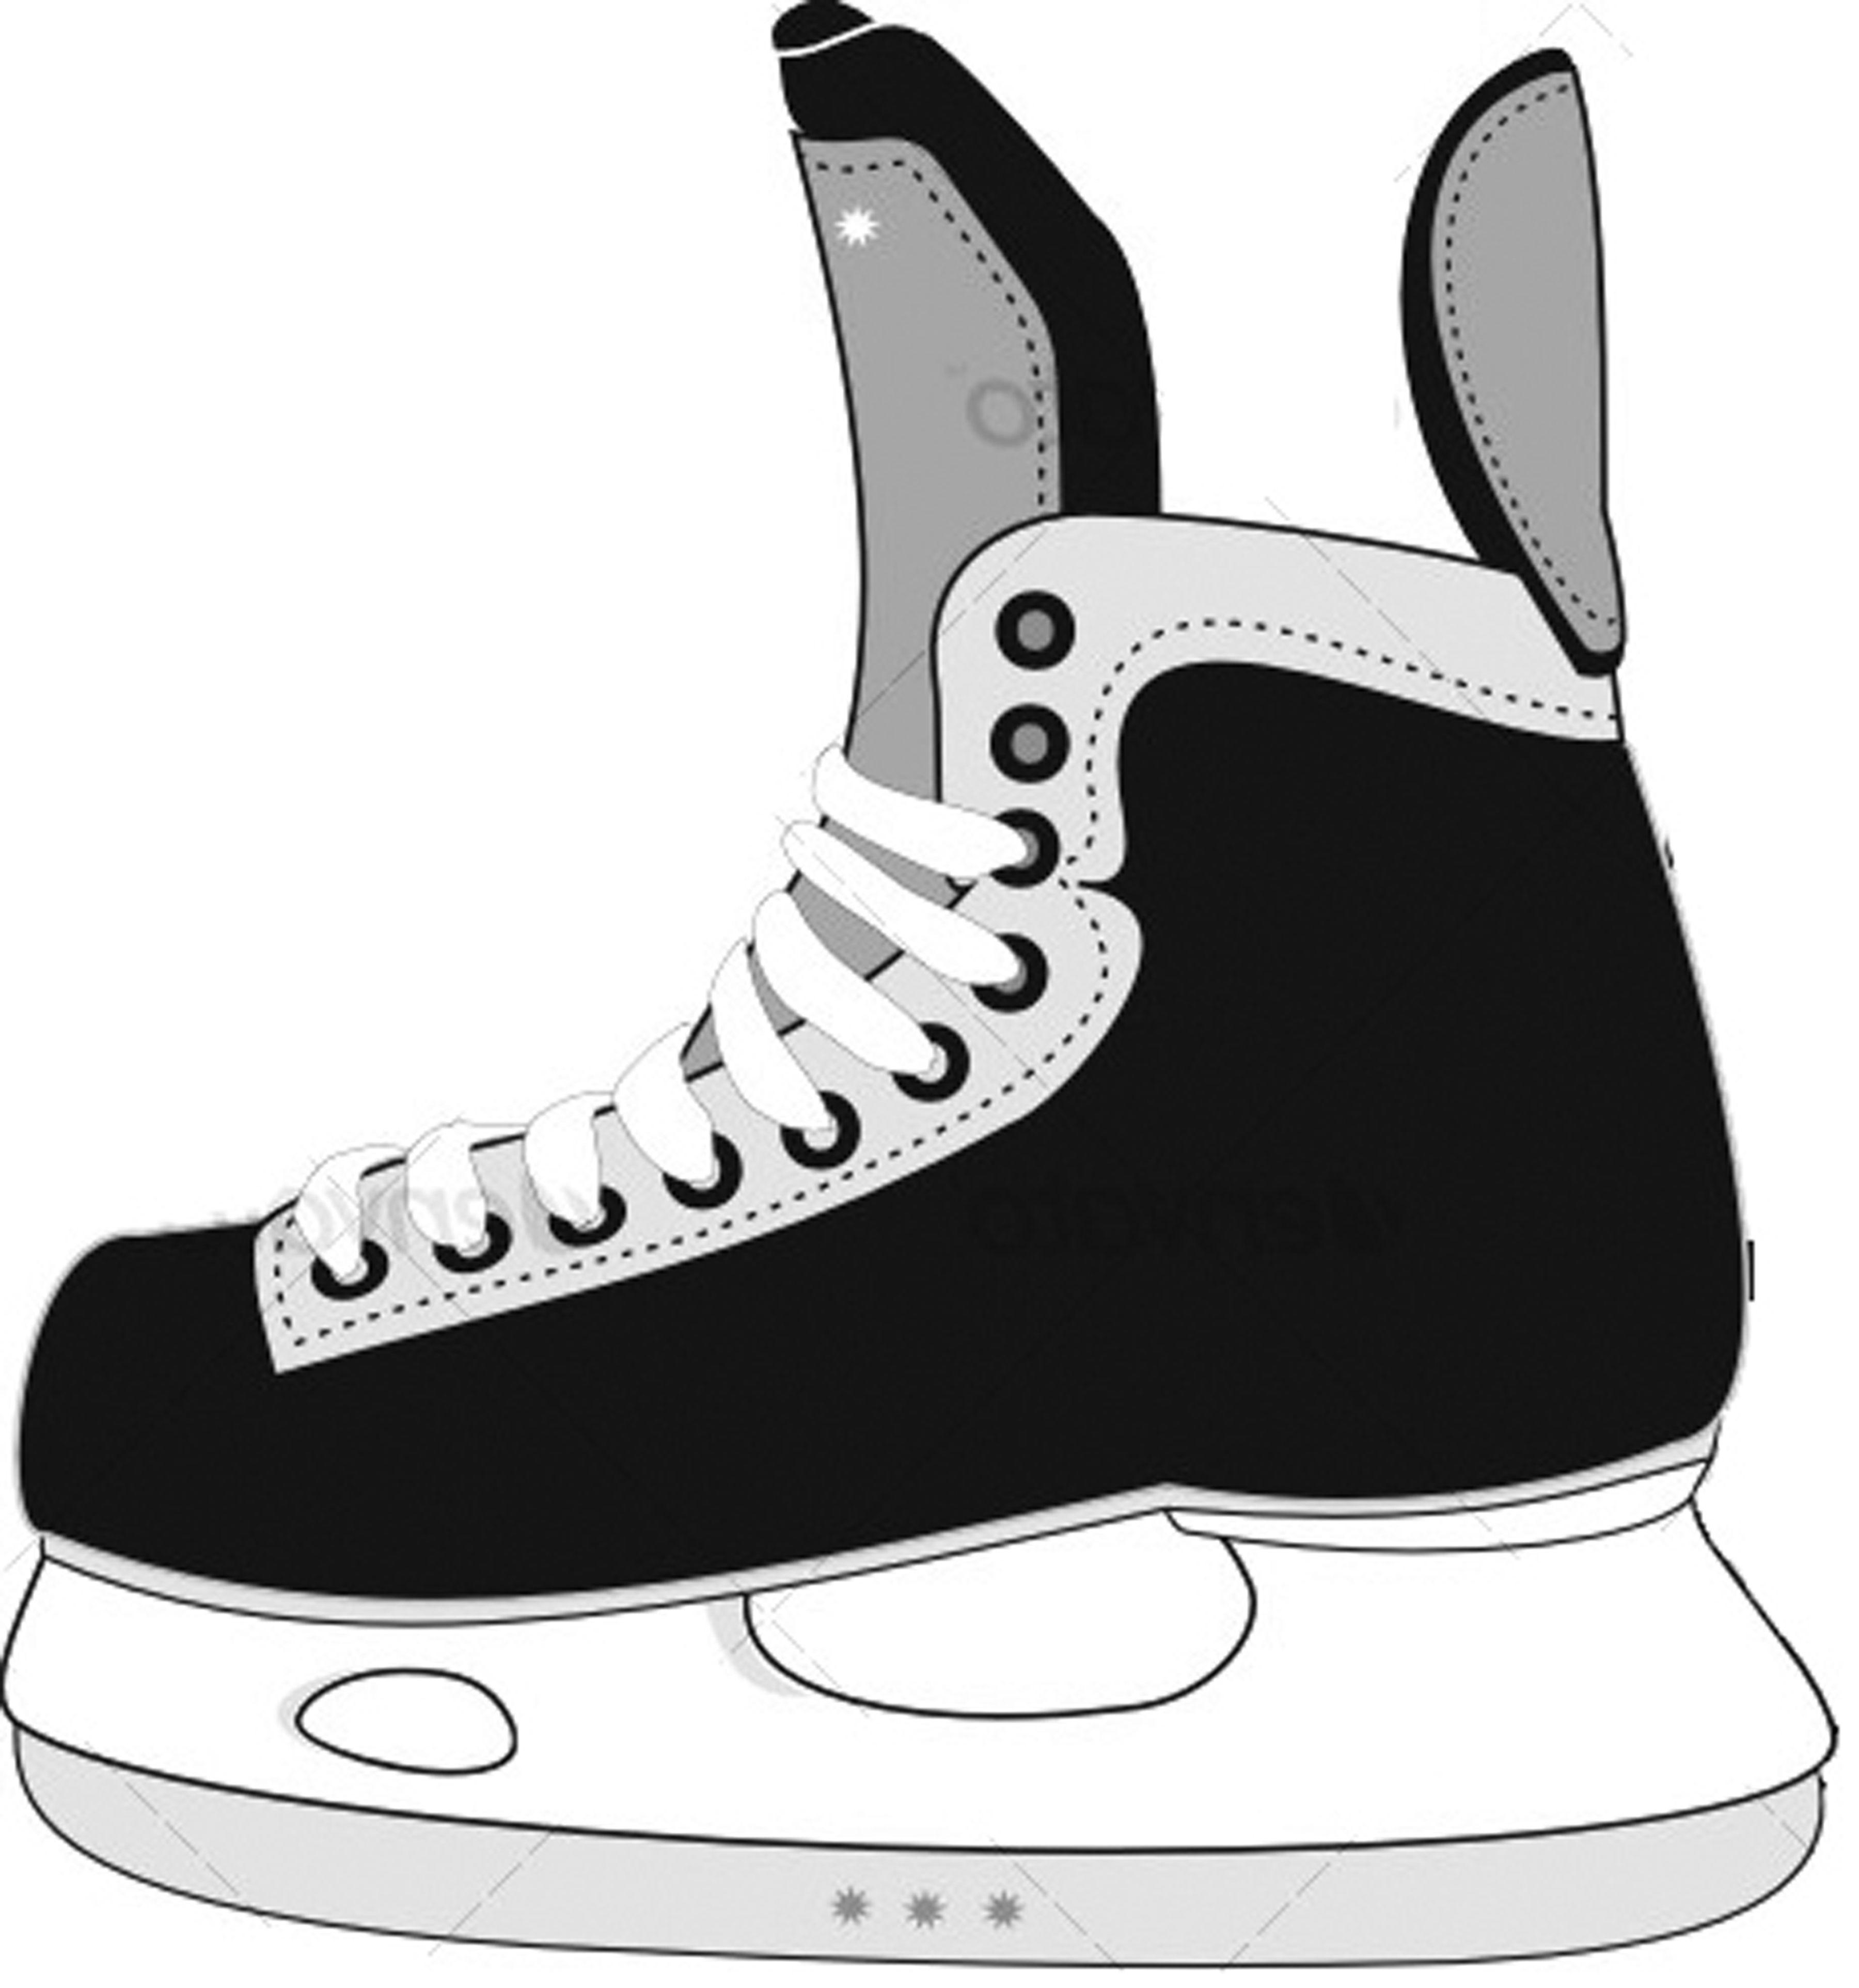 hight resolution of hockey clipart hockey tournament 663